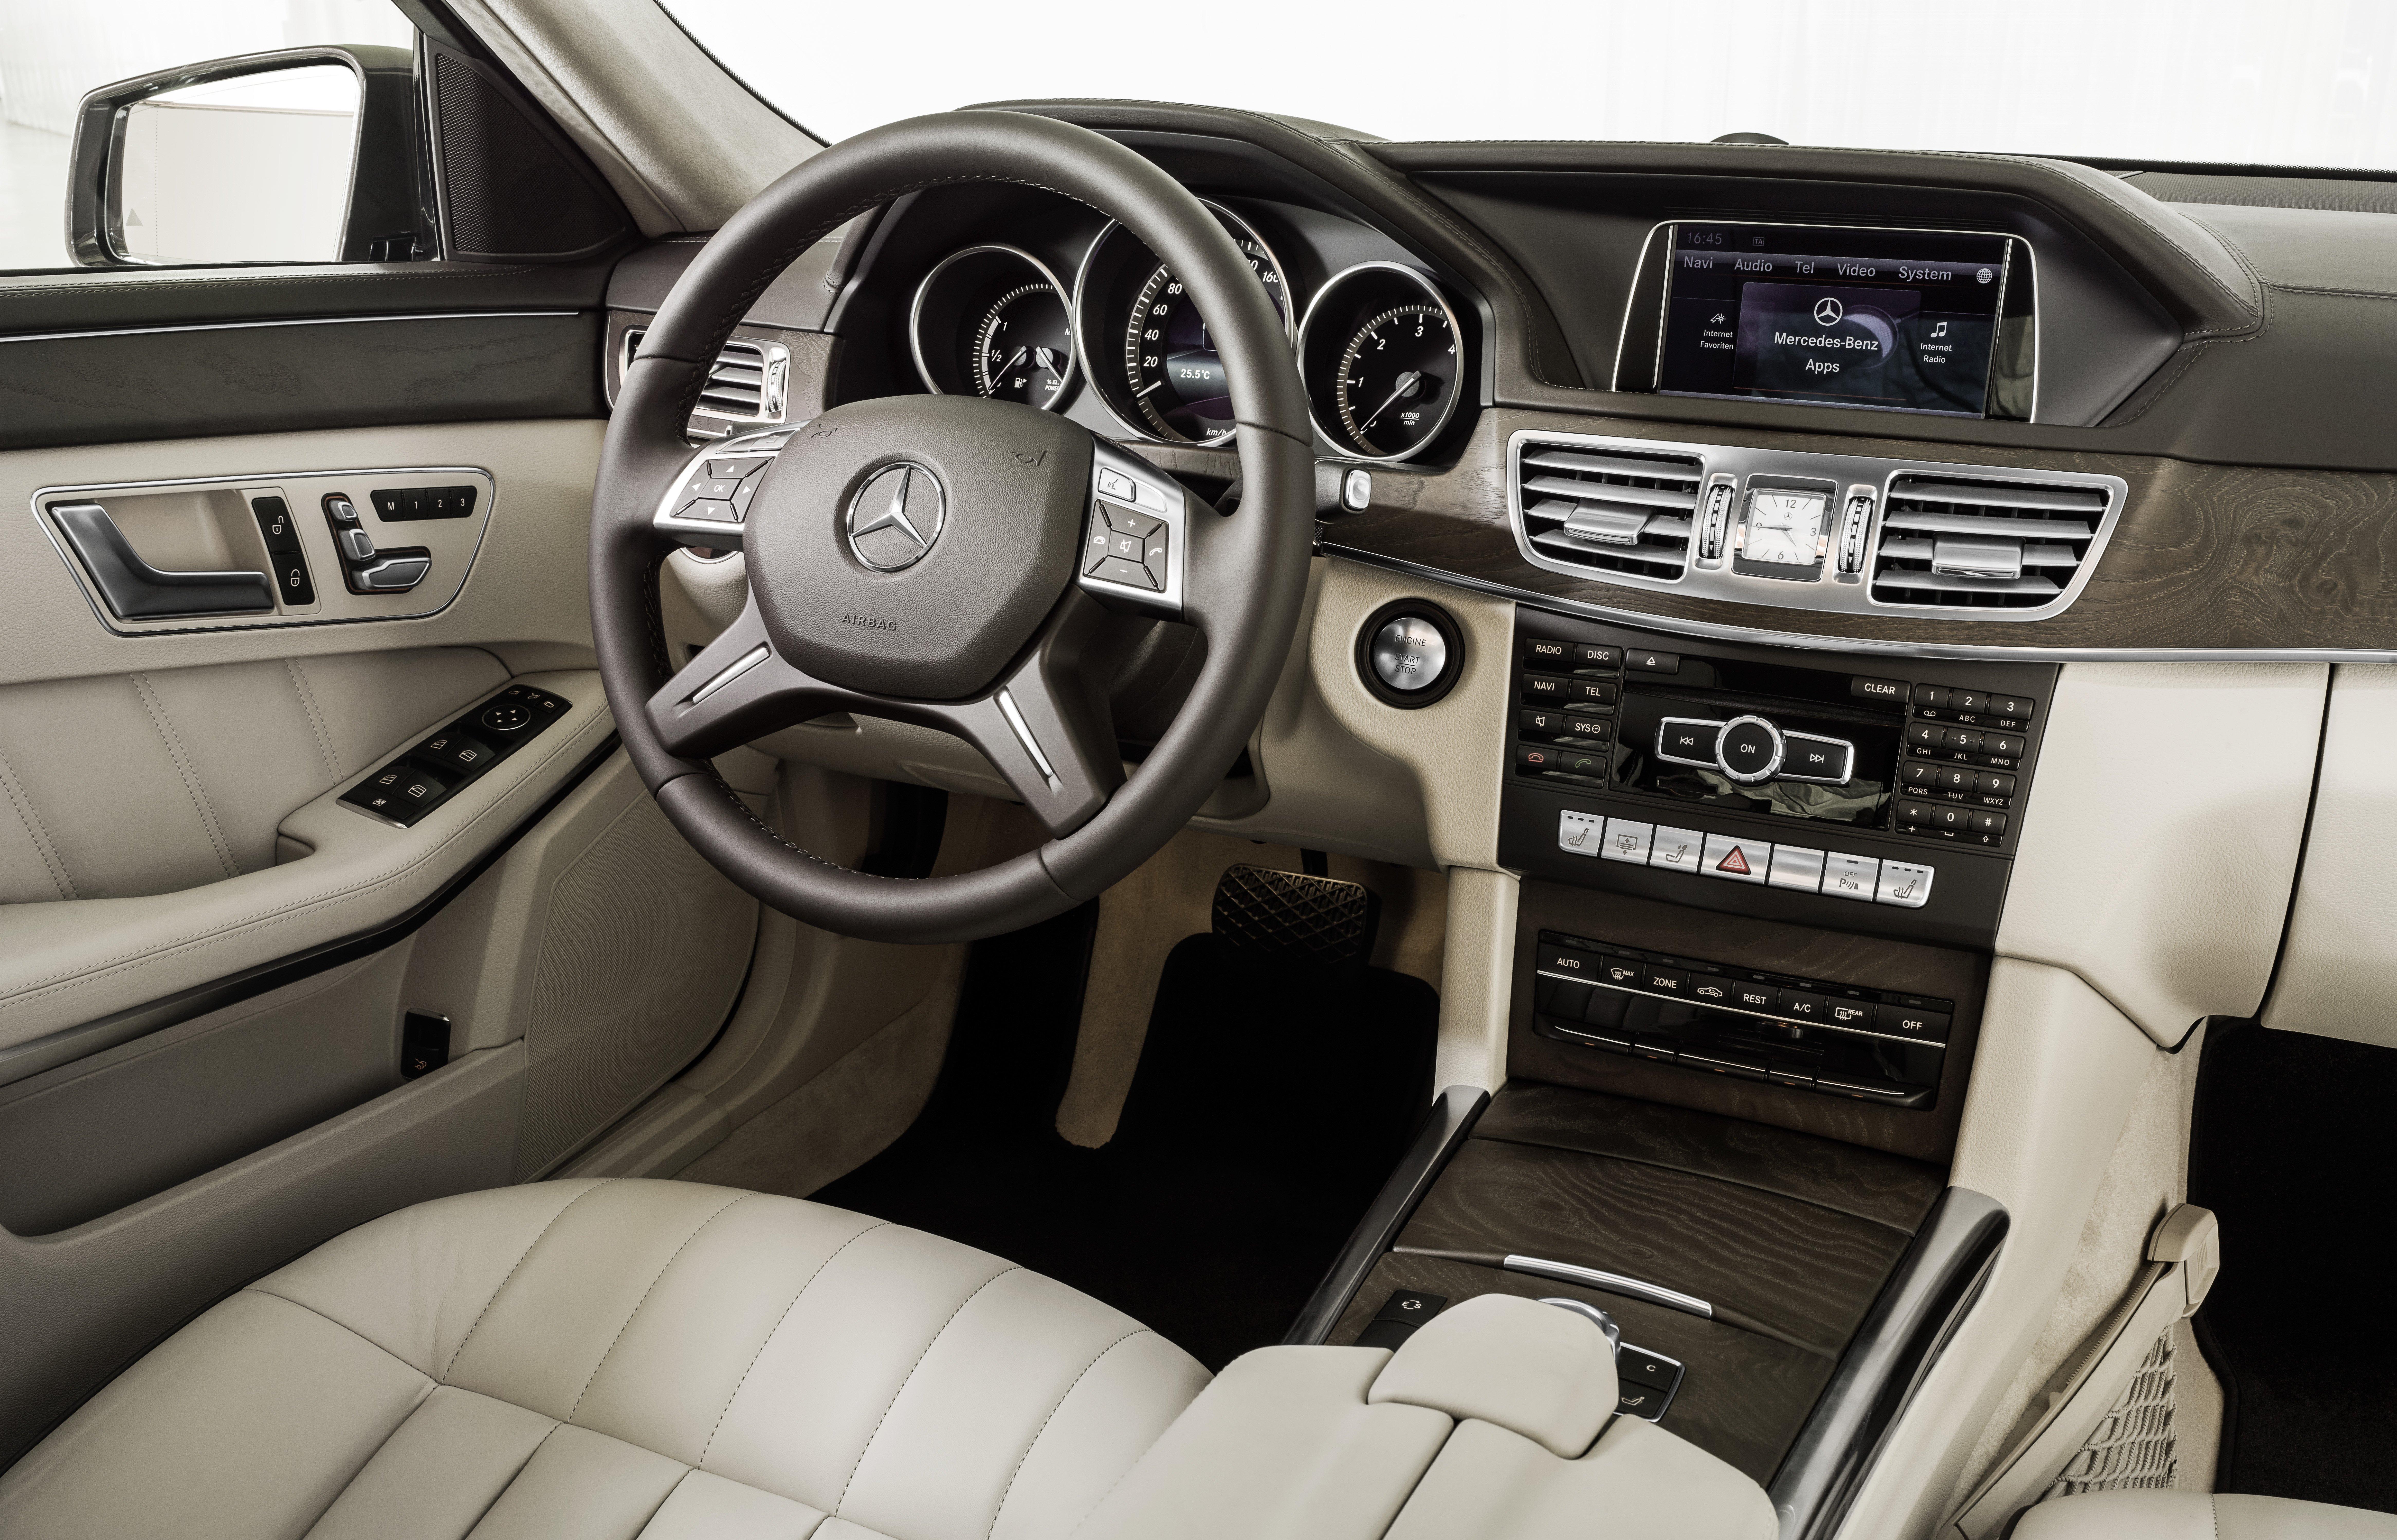 W212 Mercedes-Benz E-Class Facelift unveiled Image 145988